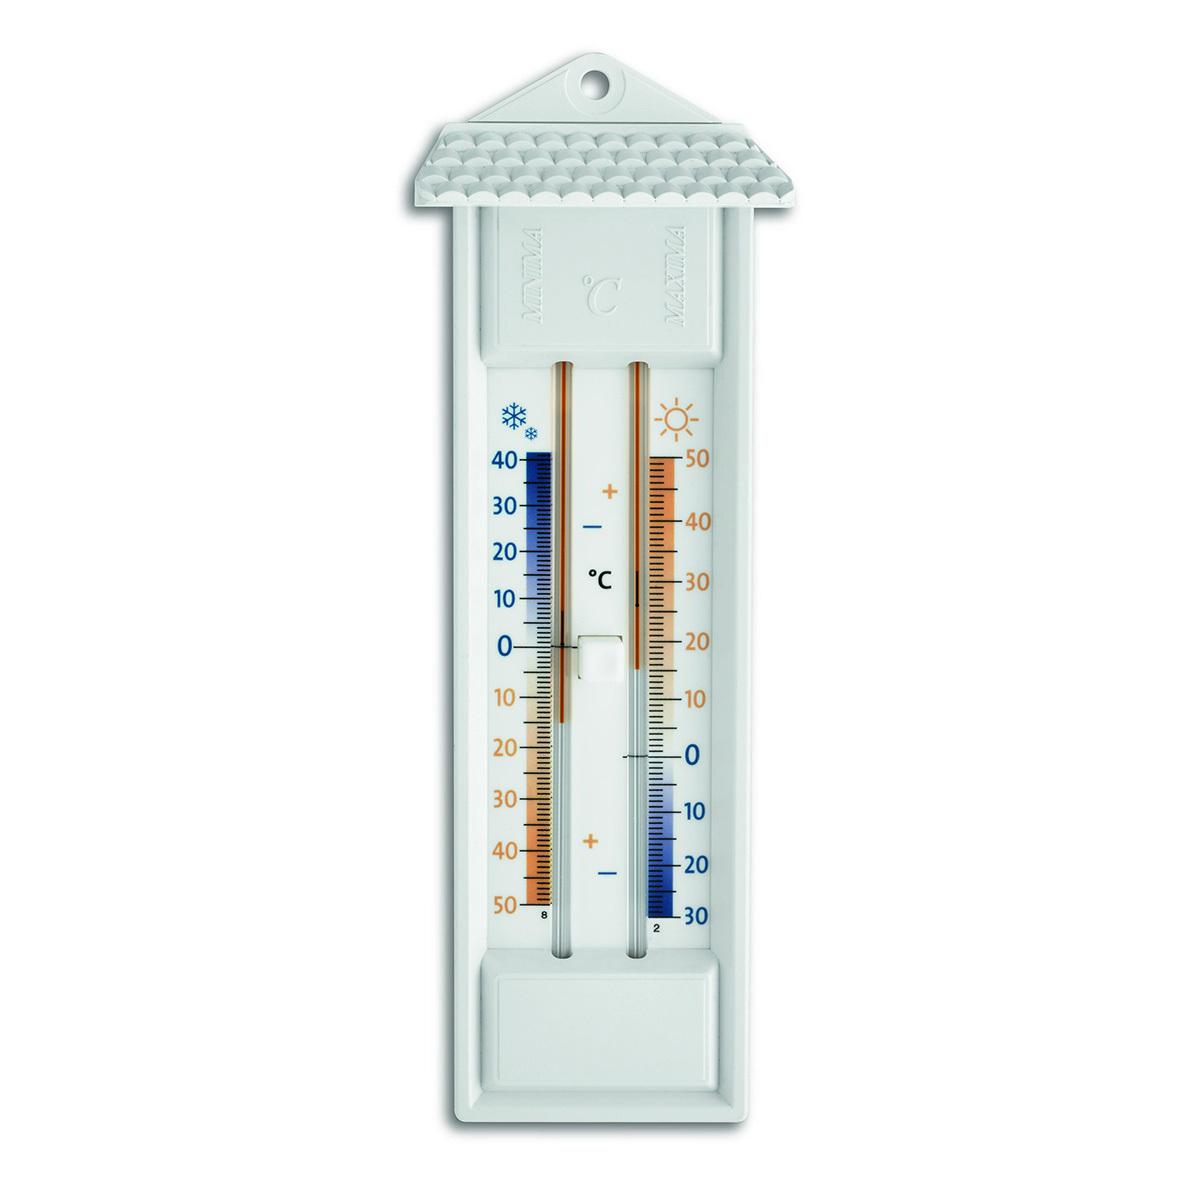 10-3014-02-01-analoges-minima-maxima-thermometer-1200x1200px.jpg